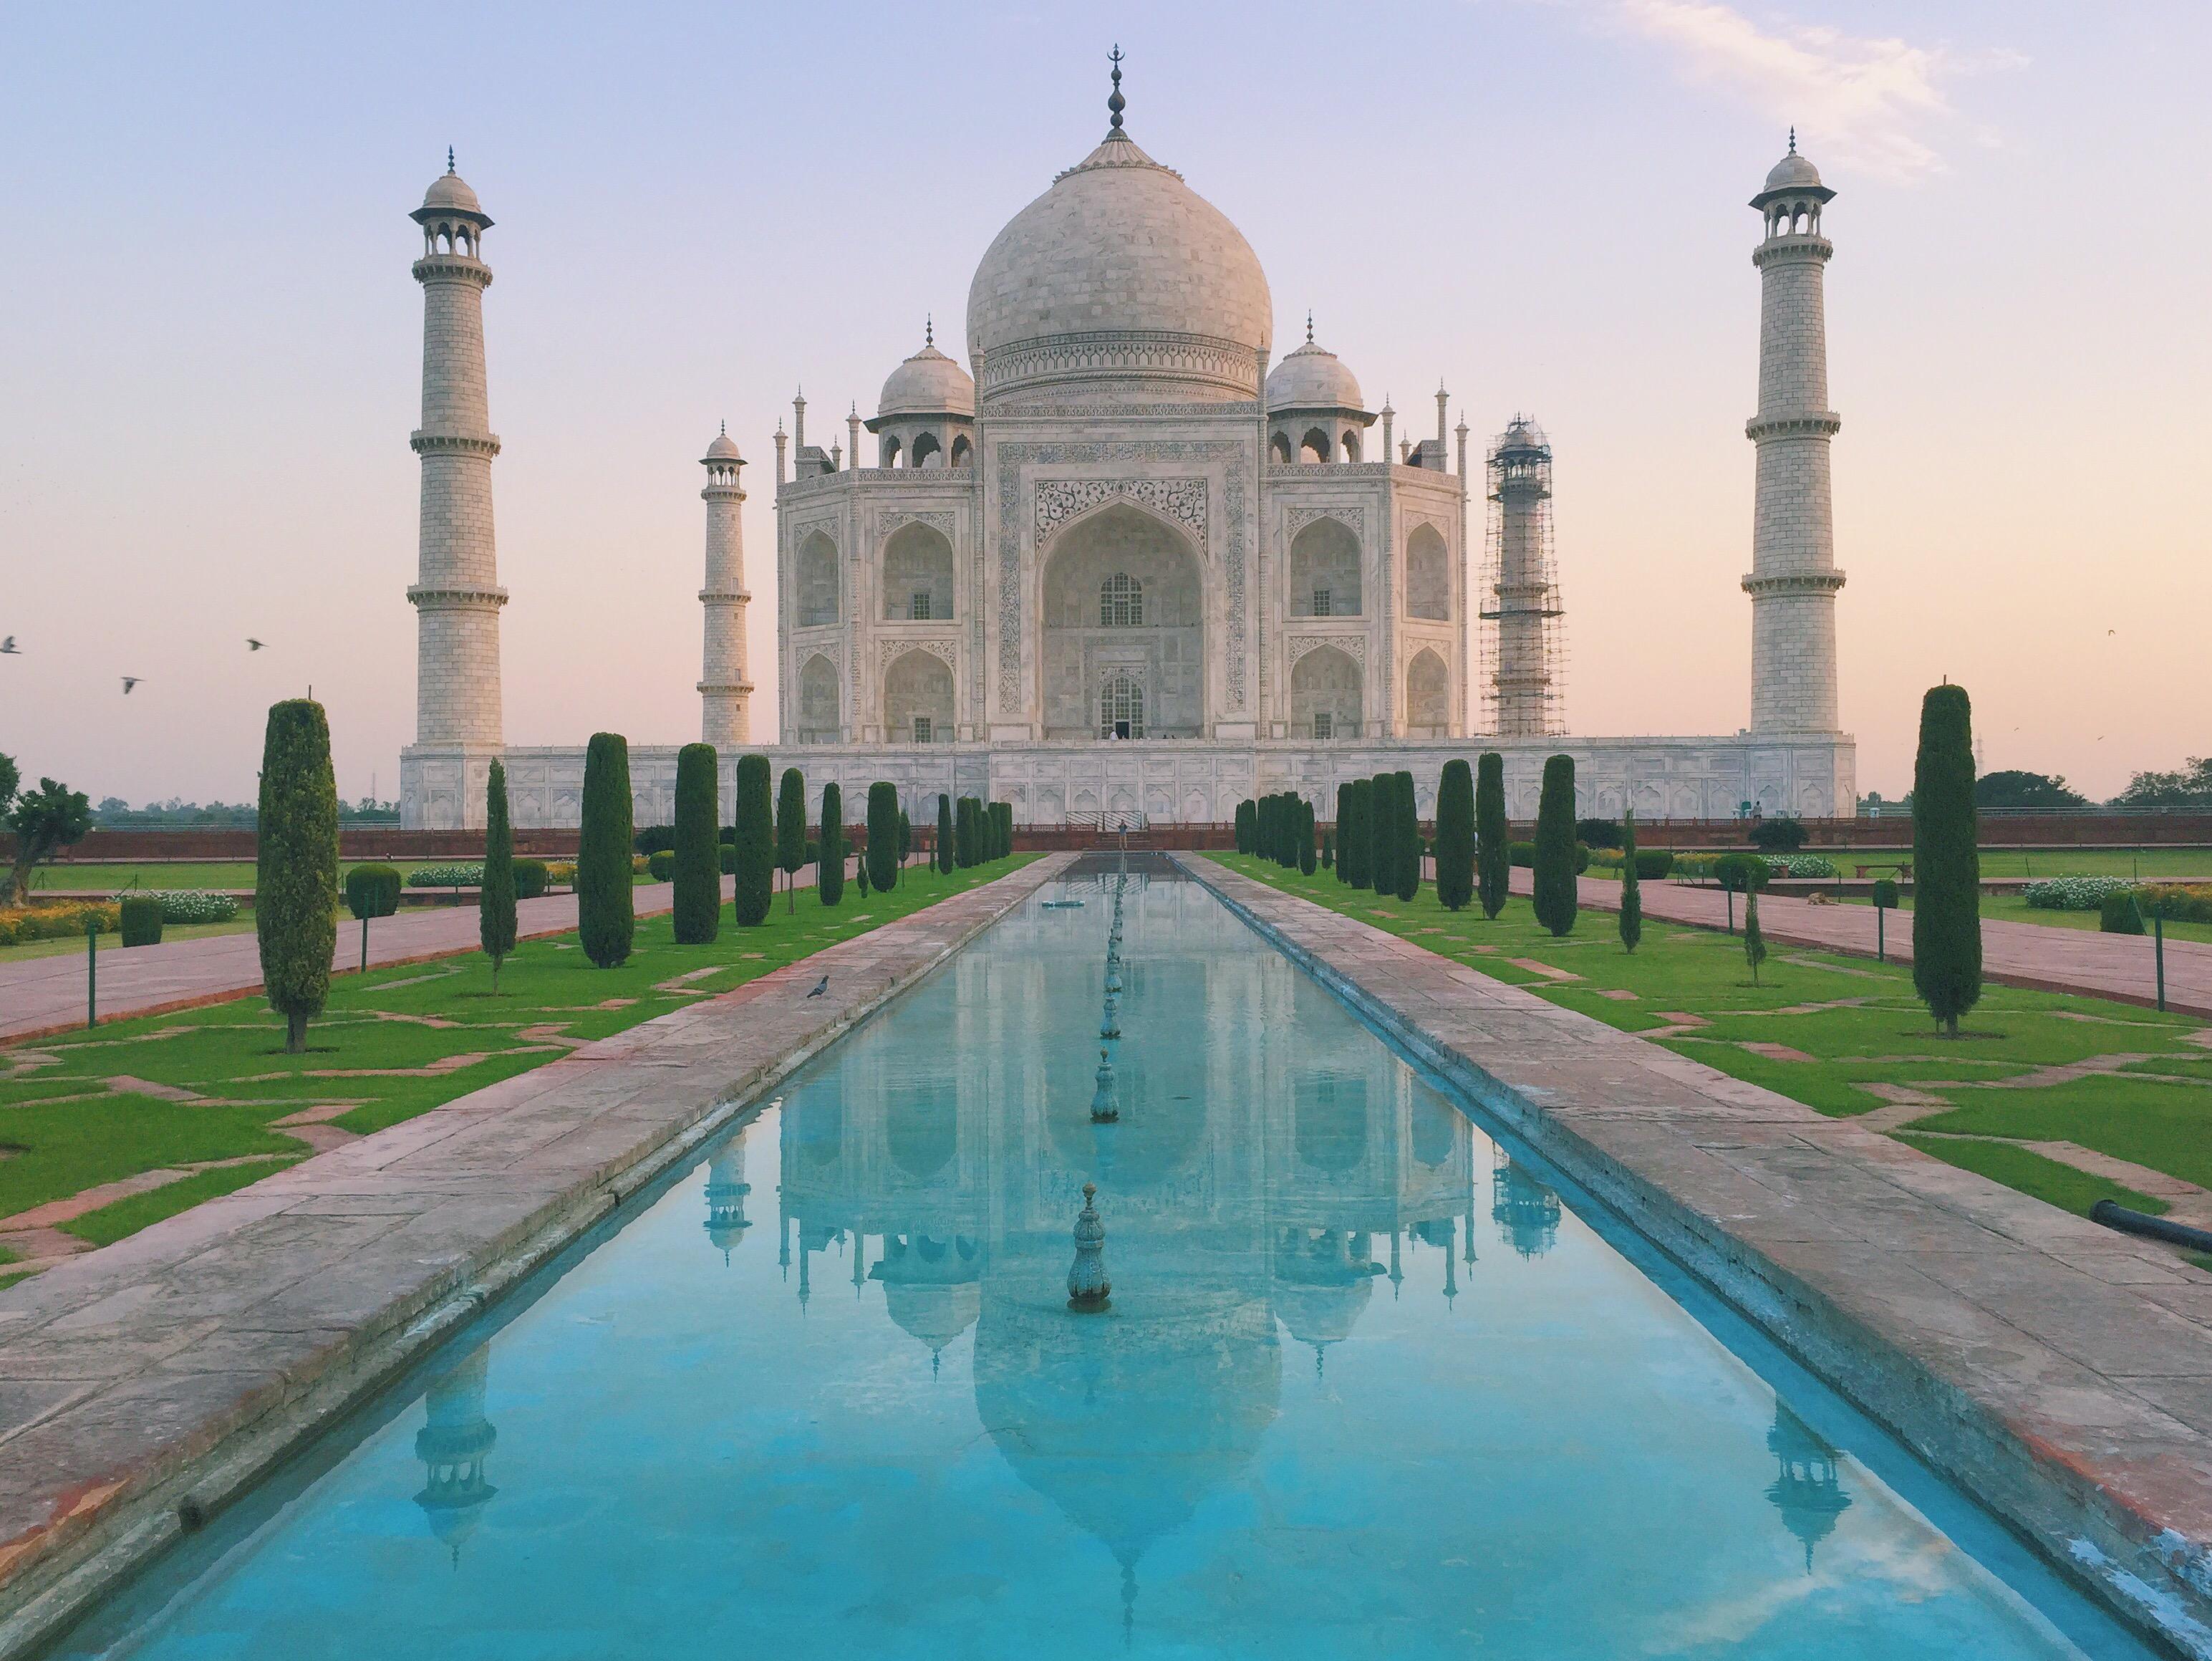 Taj Mahal Backgrounds on Wallpapers Vista